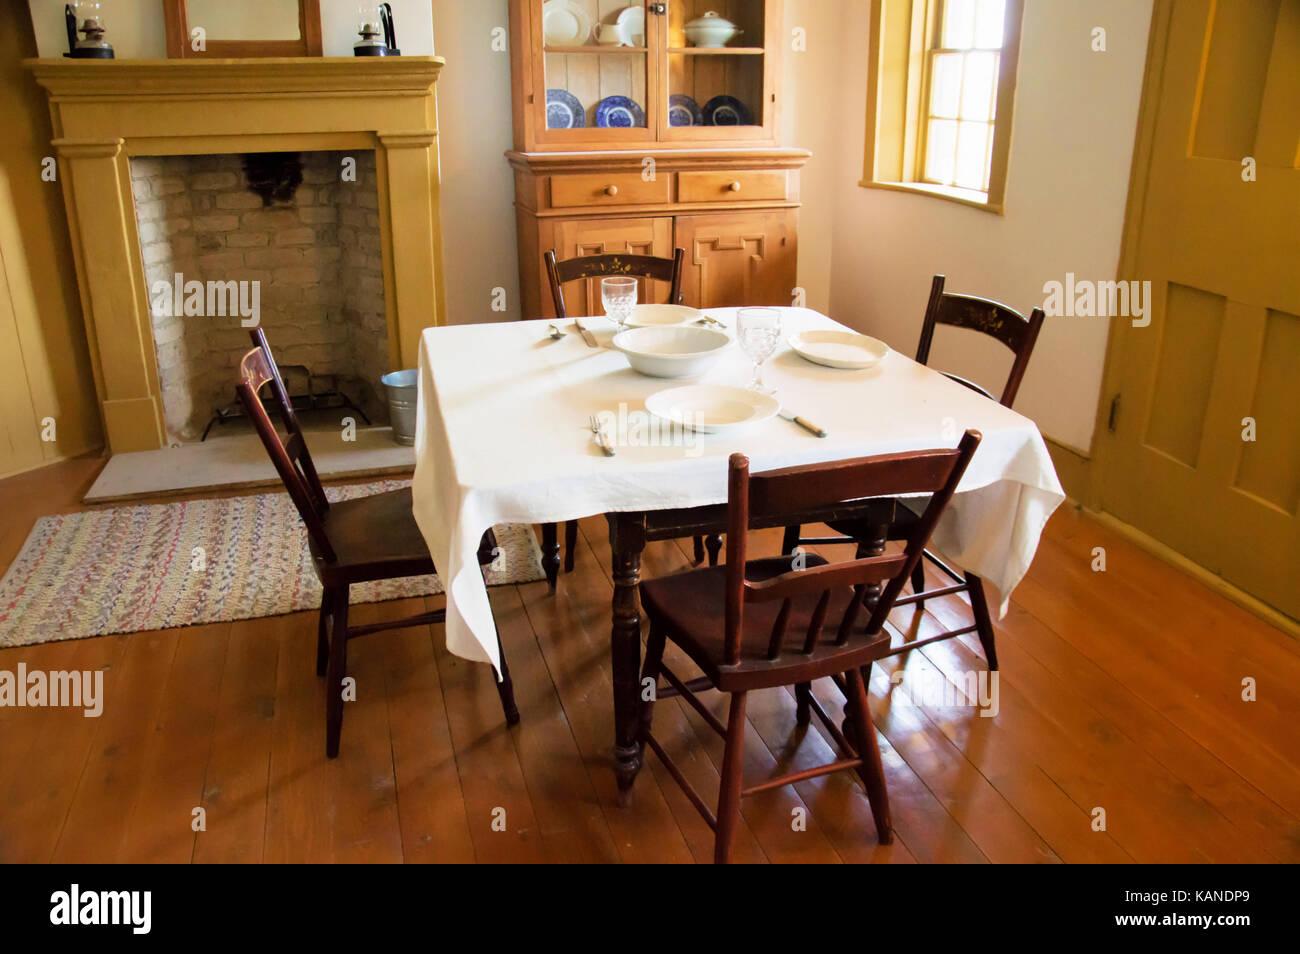 Piccola Sala Da Pranzo : Un vintage sala da pranzo in una piccola casa a foto & immagine